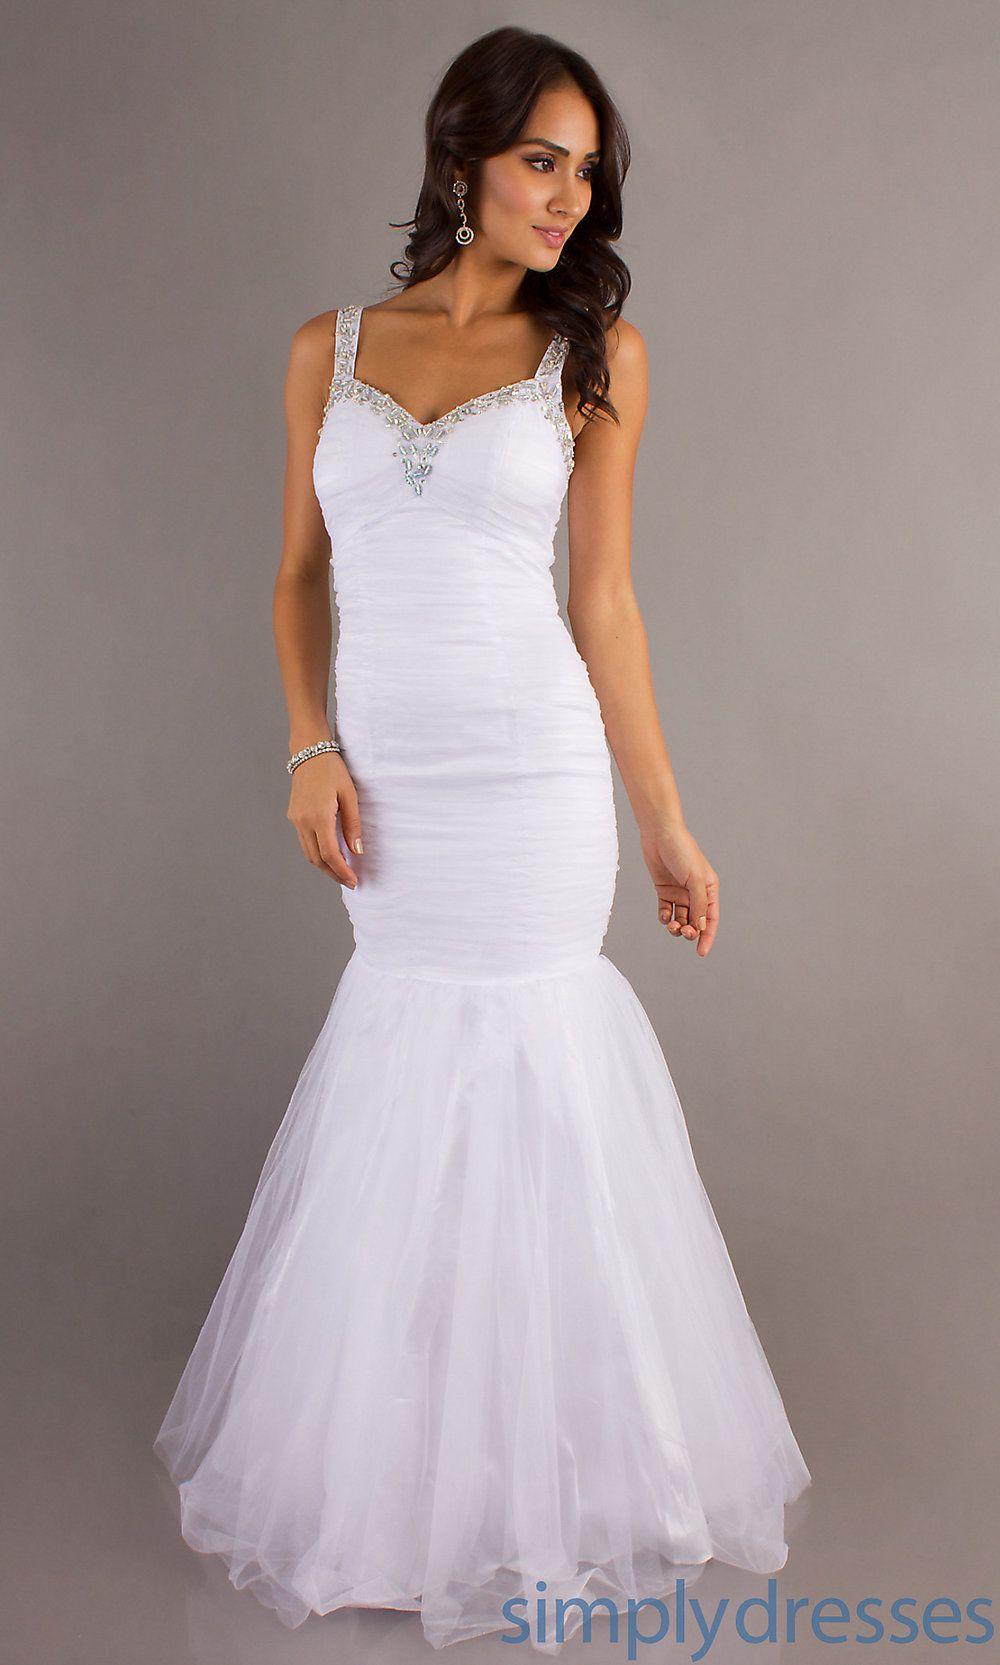 Long mermaid dresses white mermaid prom dresses simply dresses